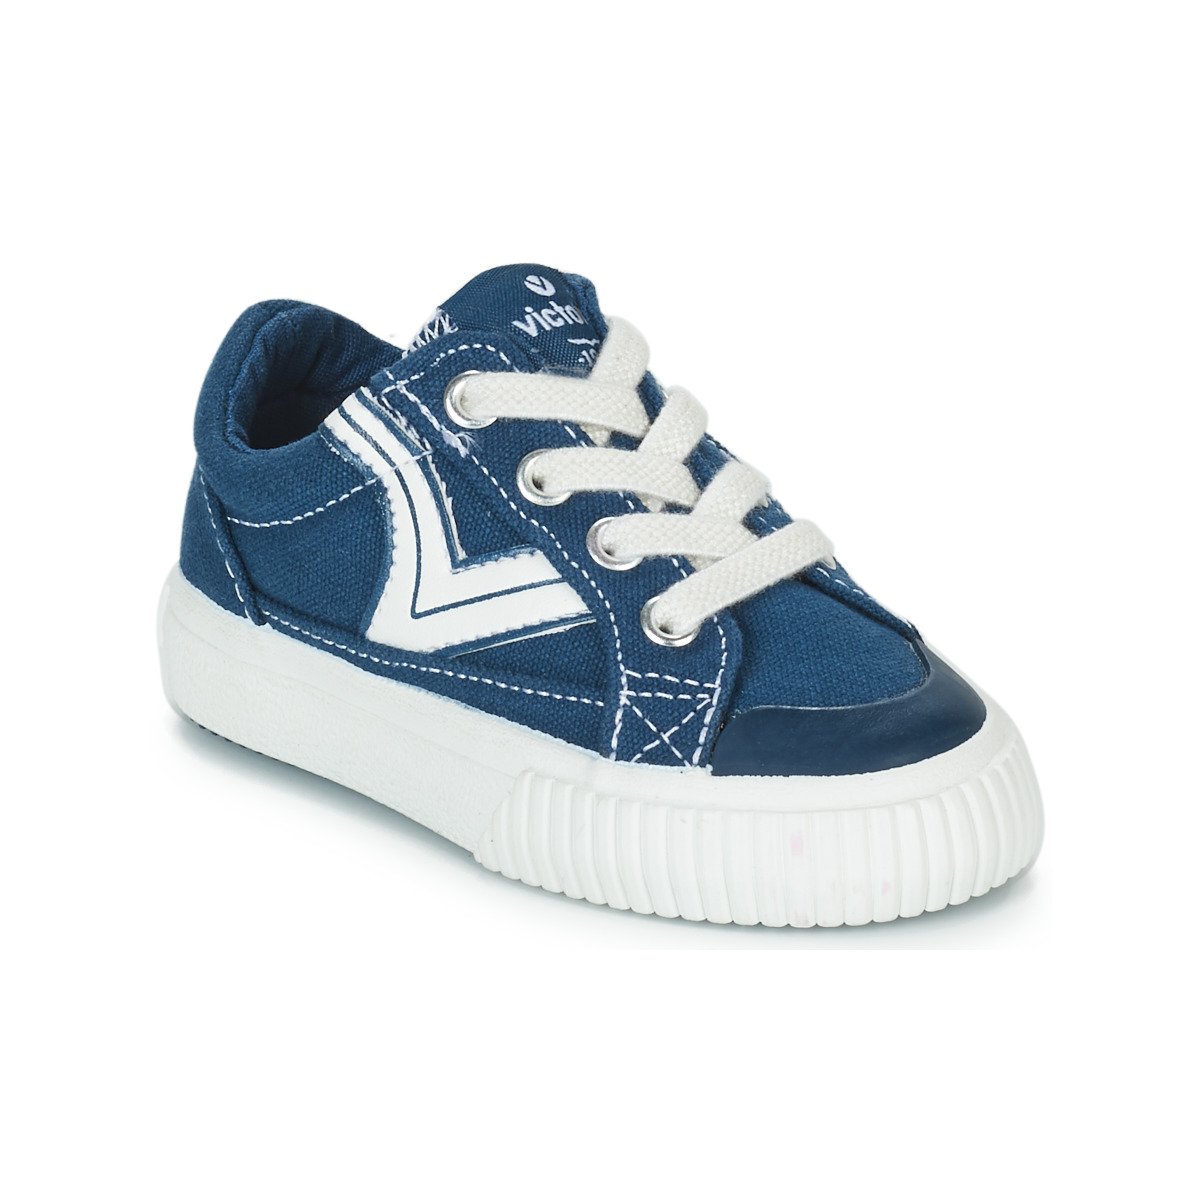 Sneakers til børn Victoria  TRIBU LONA RETRO